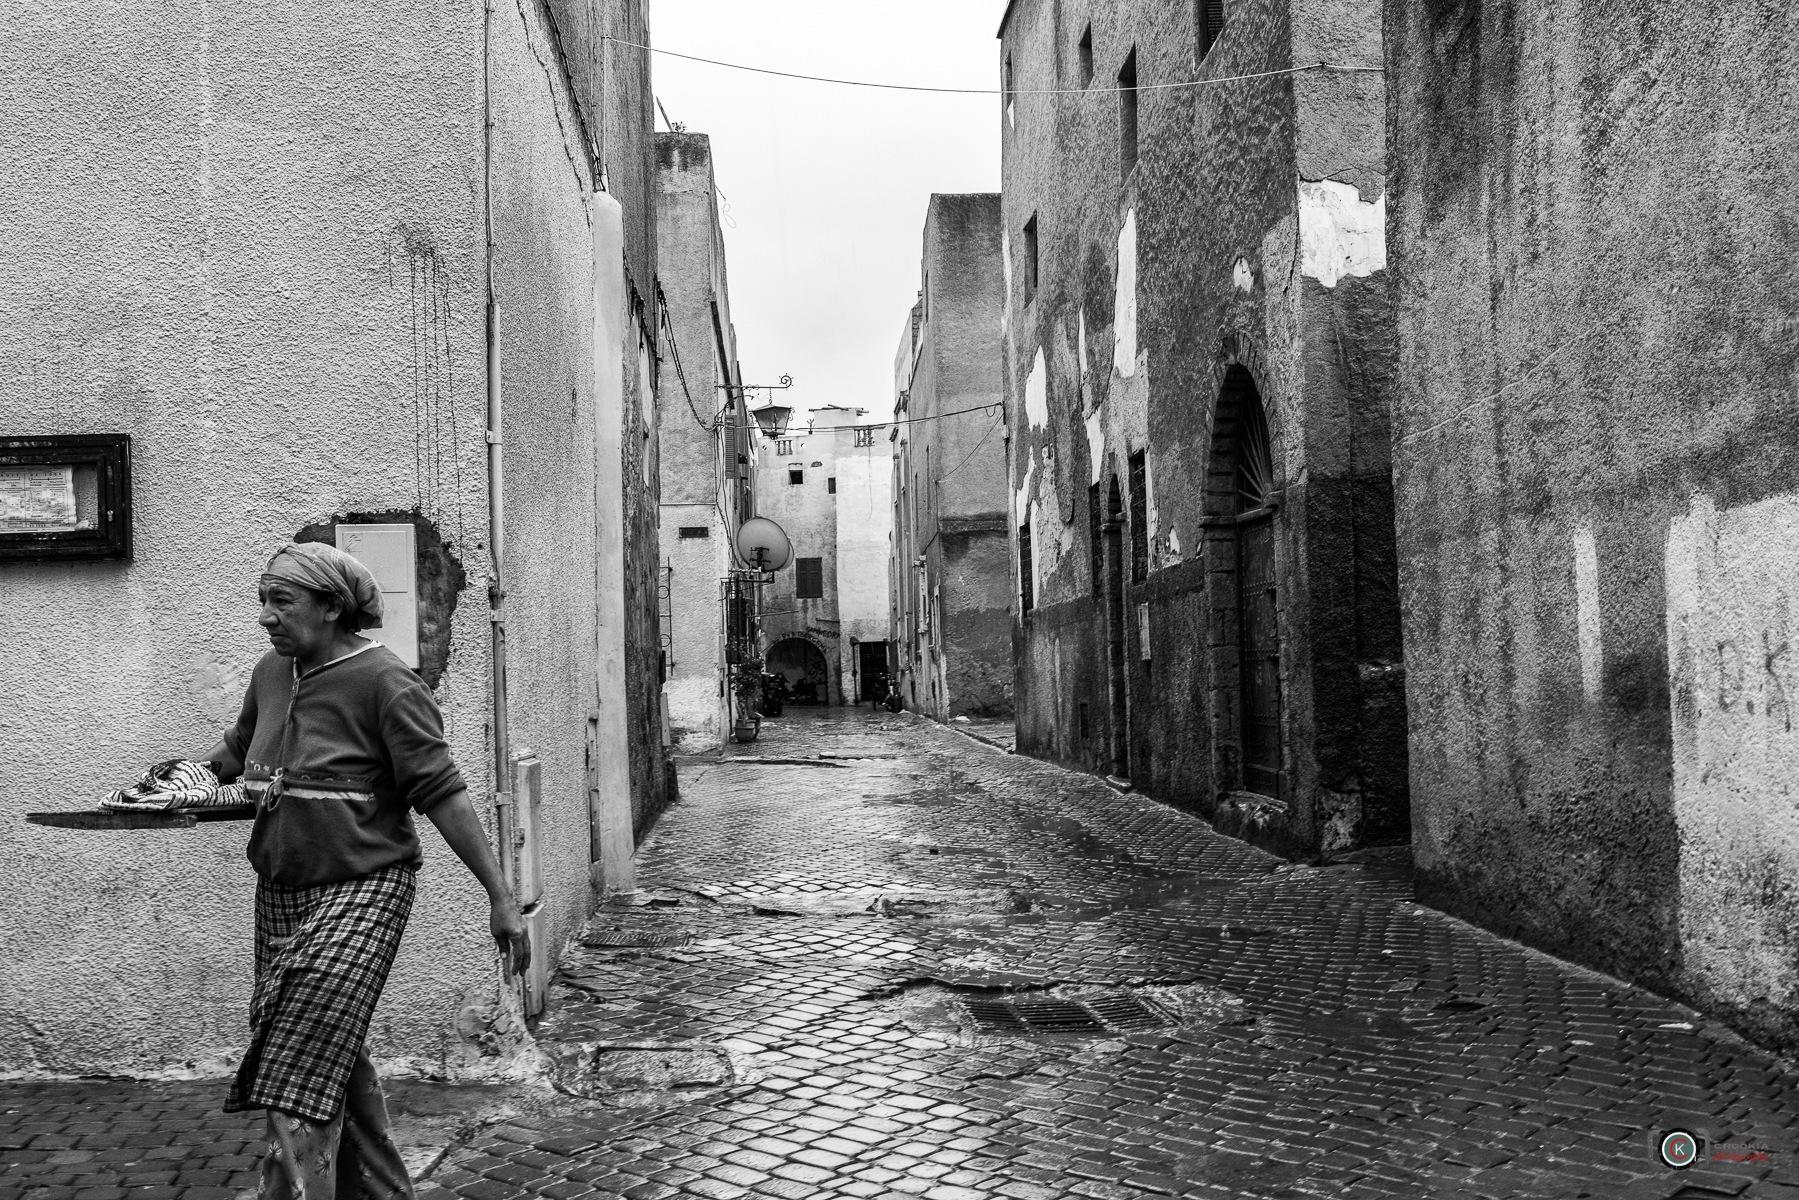 Life On The Street II EI Jadida-Morocco  by chookia